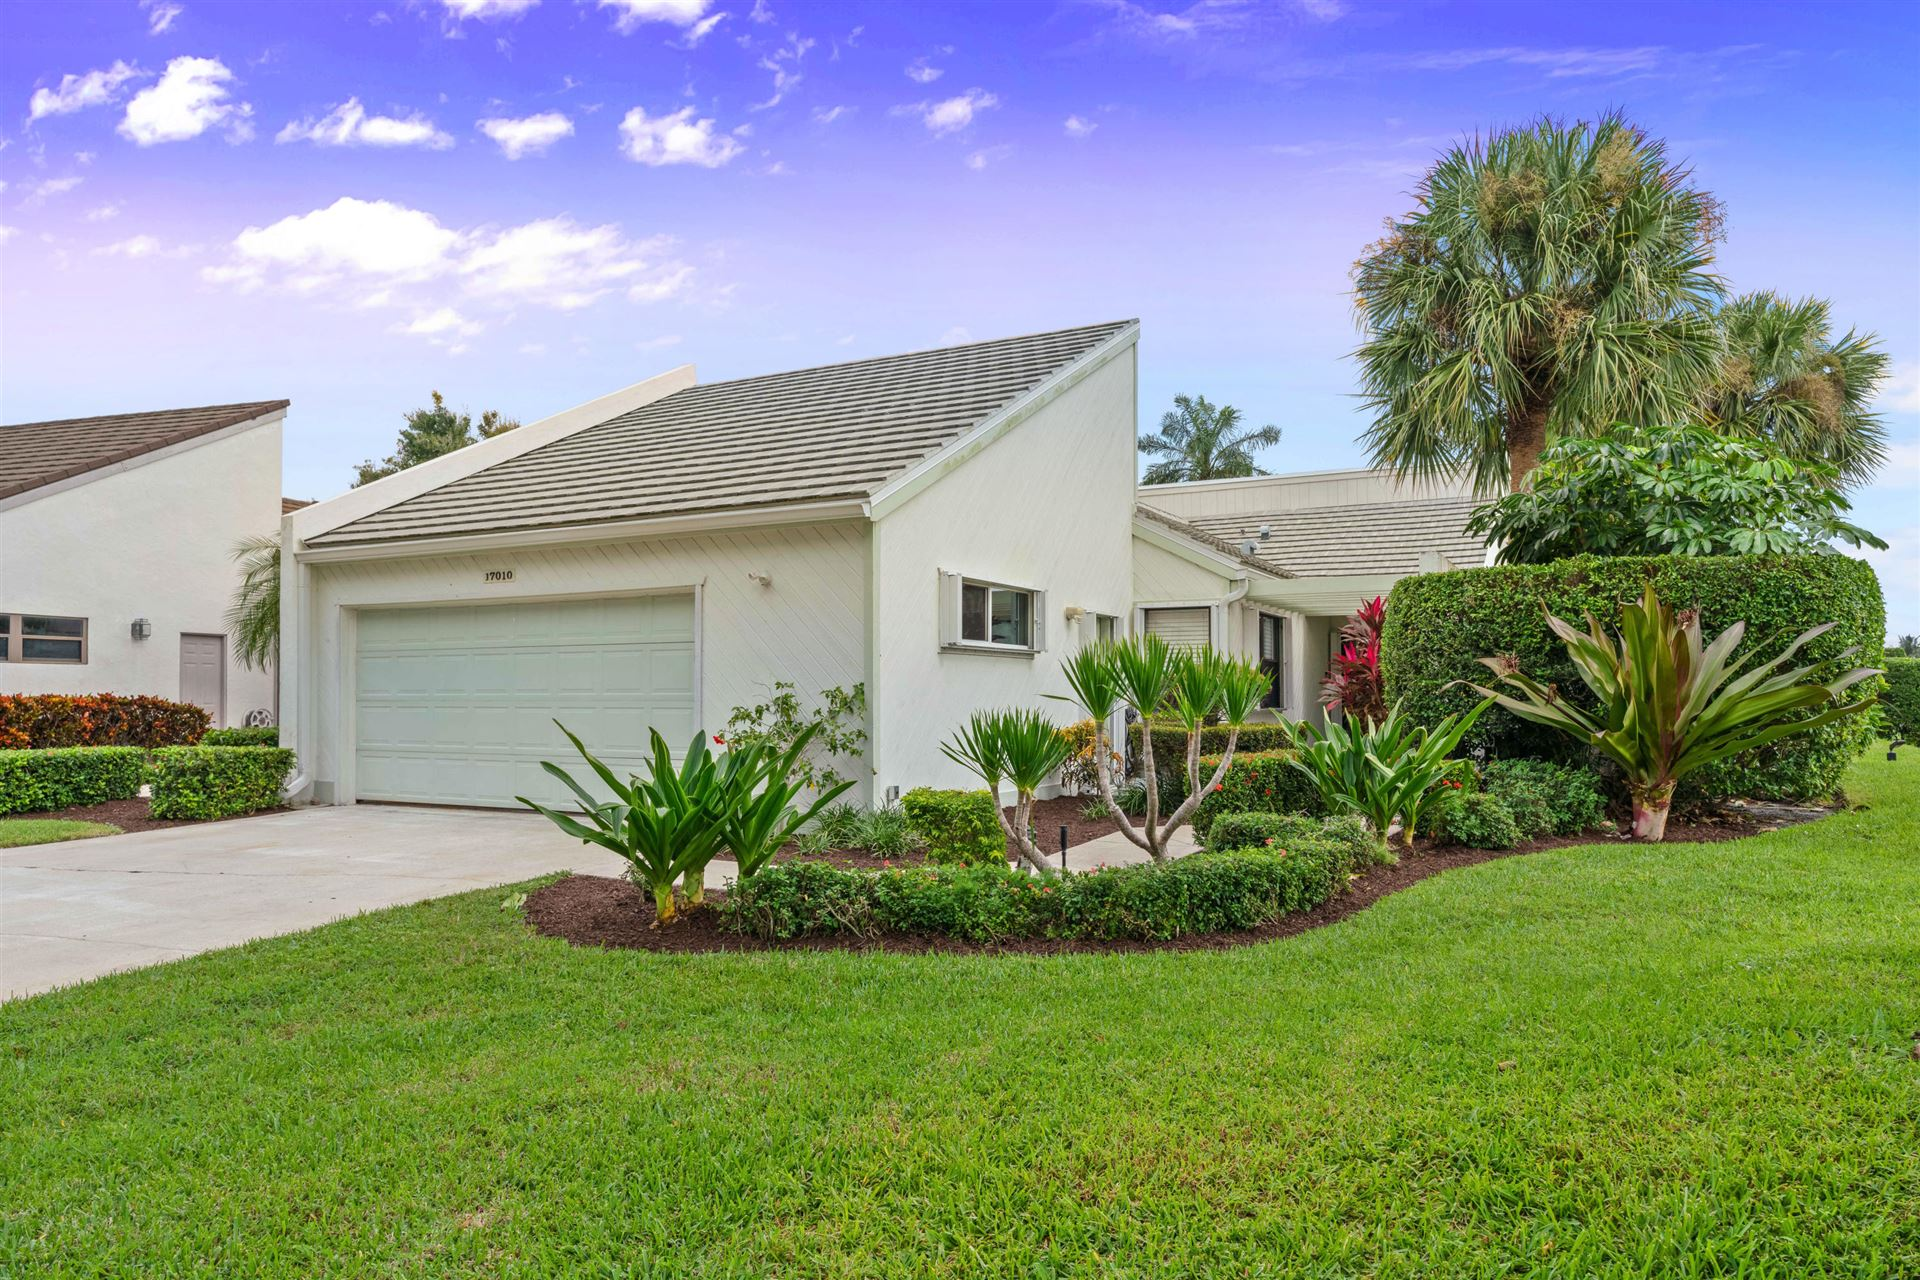 17010 Traverse Circle, Jupiter, FL 33477 - MLS#: RX-10656153